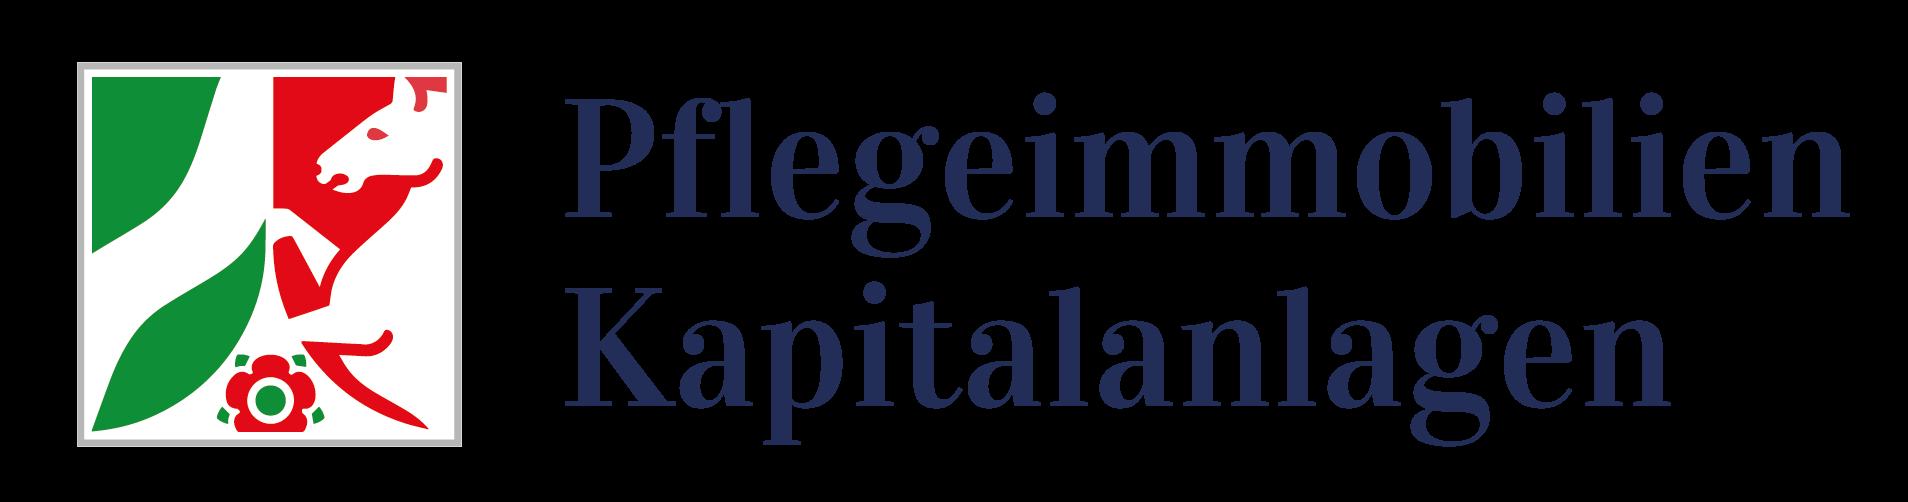 Pflegeimmobilien Kapitalanlagen